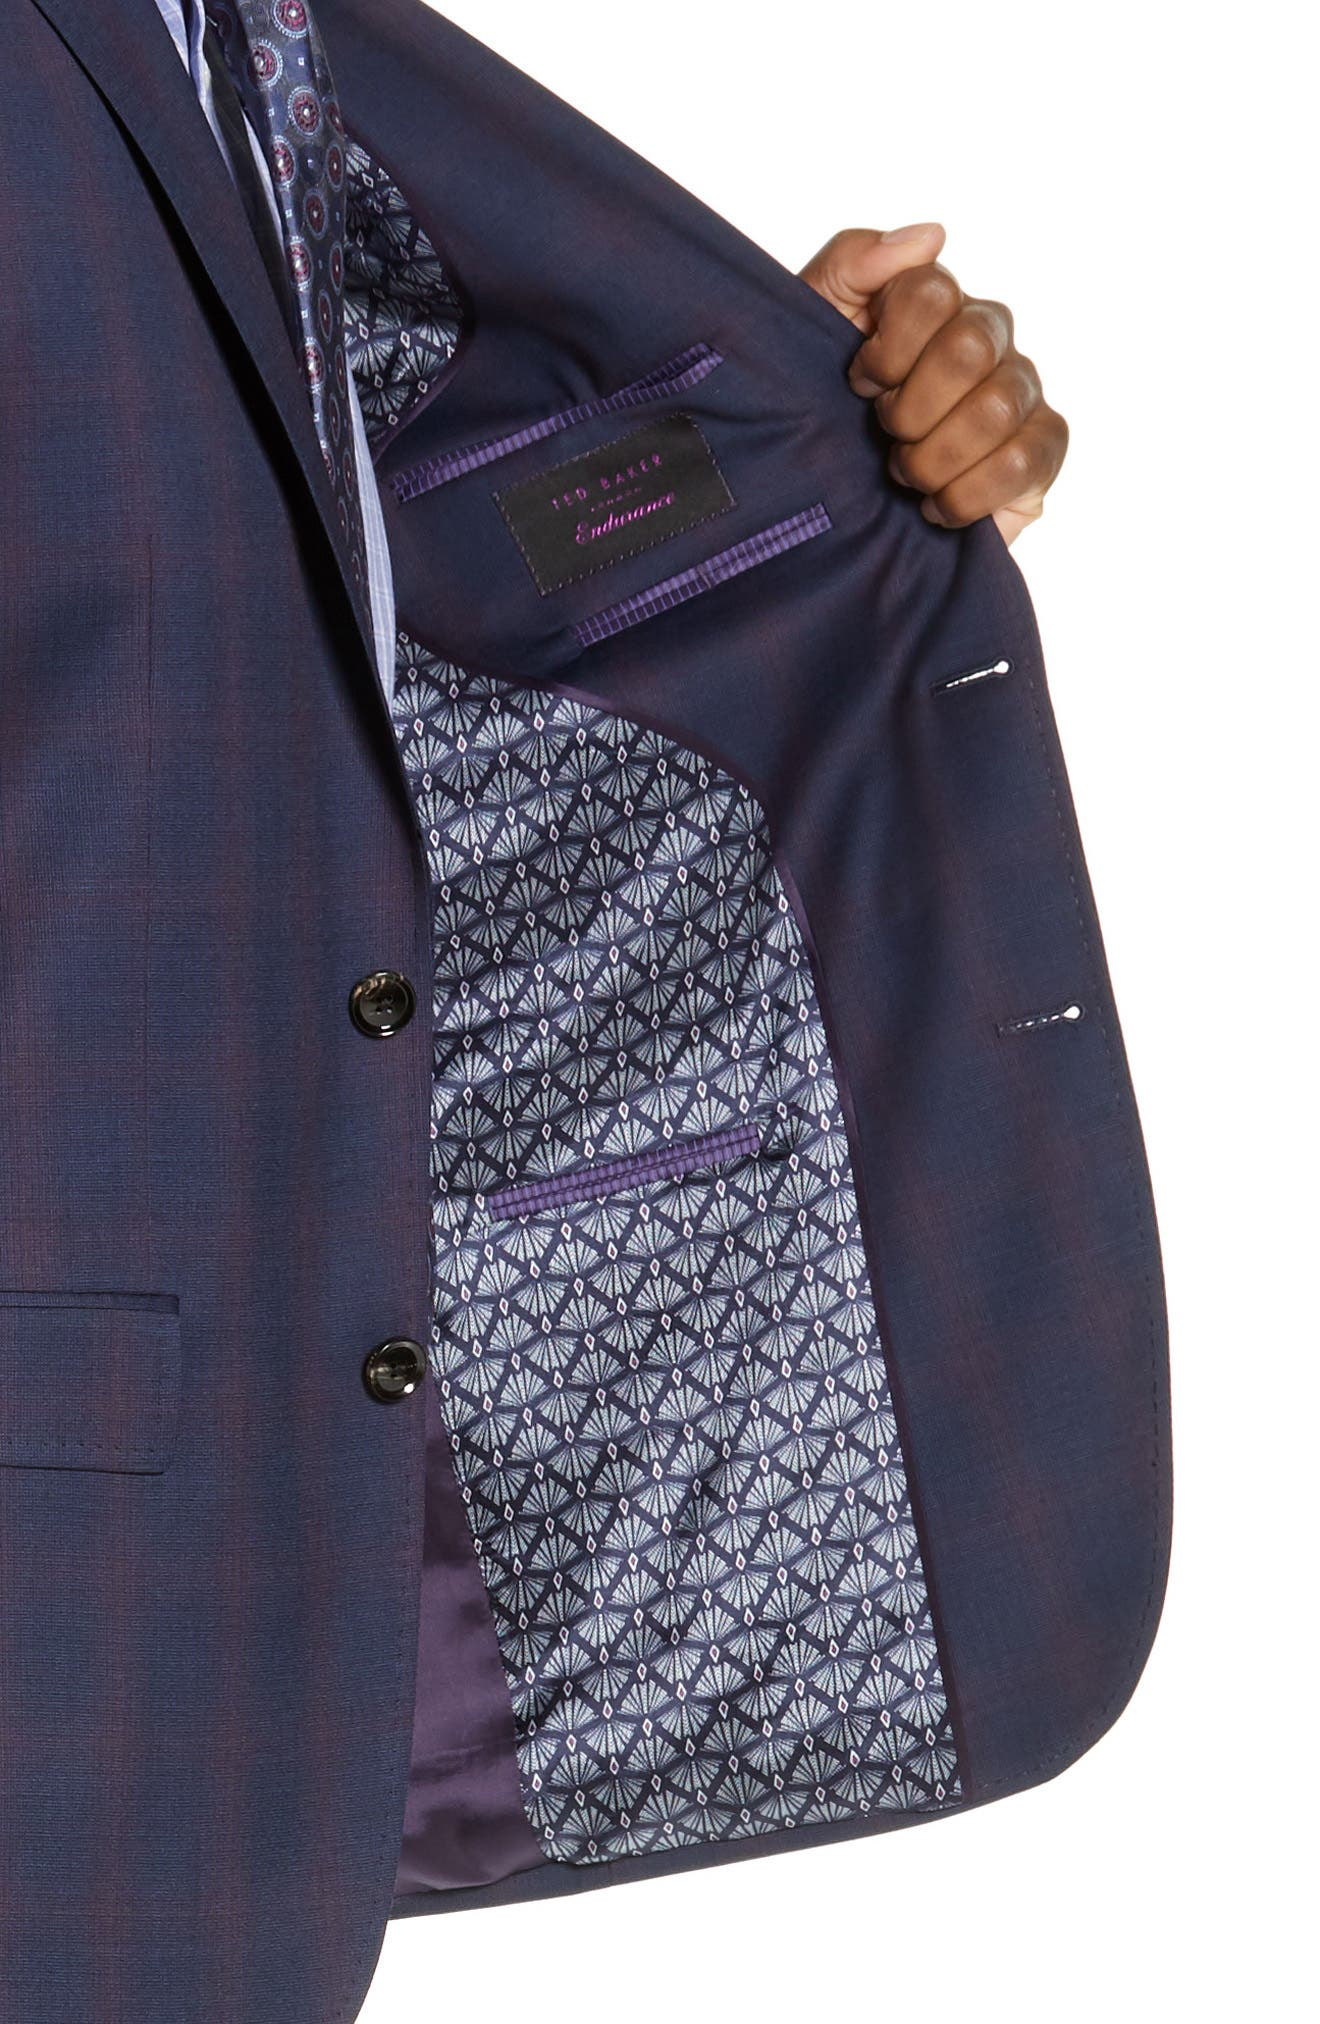 TED BAKER LONDON,                             Roger Slim Fit Plaid Wool Suit,                             Alternate thumbnail 4, color,                             NAVY